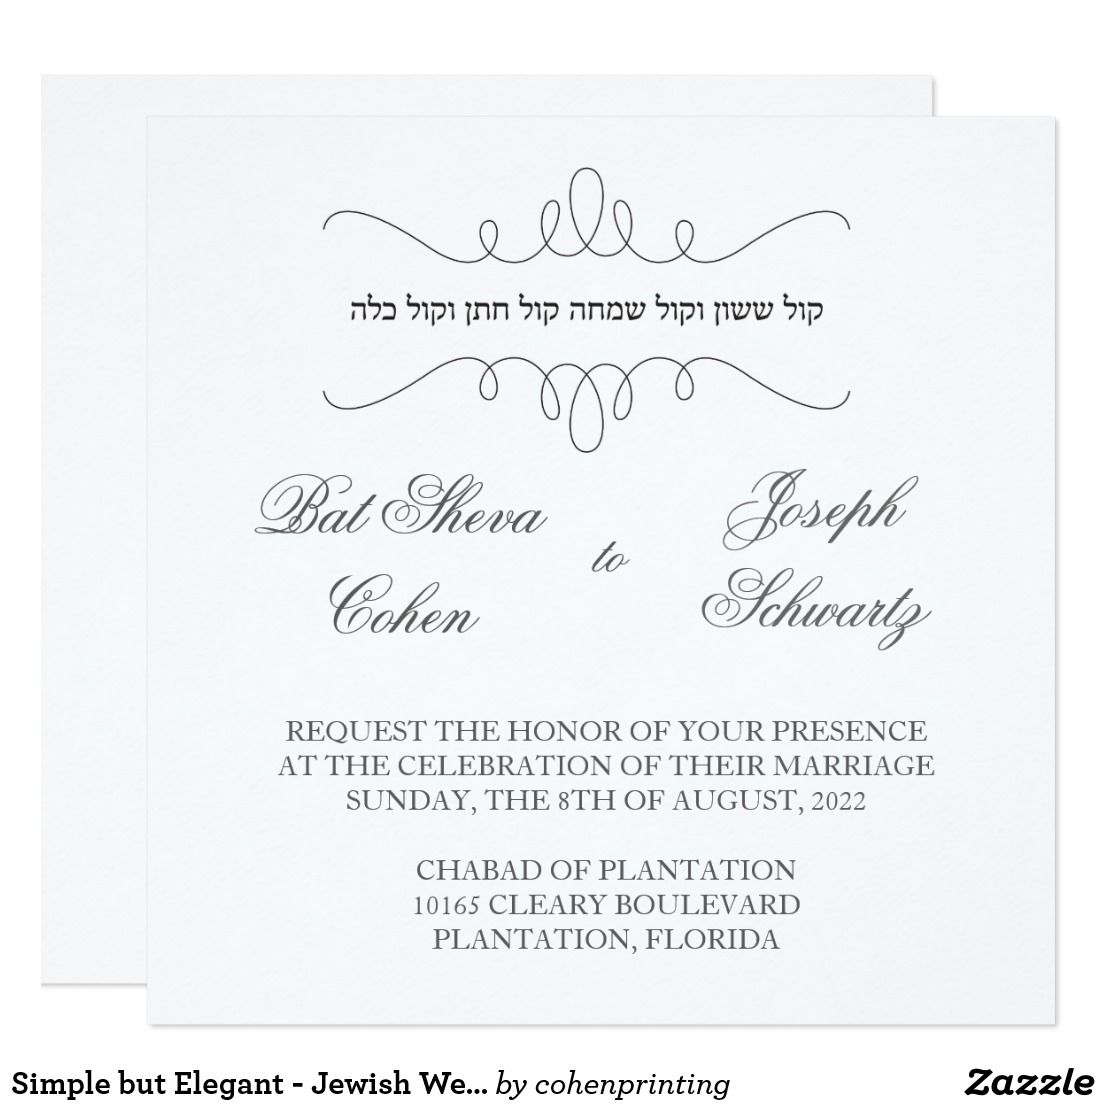 Simple but Elegant - Jewish Wedding Invitation | Zazzle.com | Jewish wedding  invitations, Fun wedding invitations, Zazzle wedding invitations